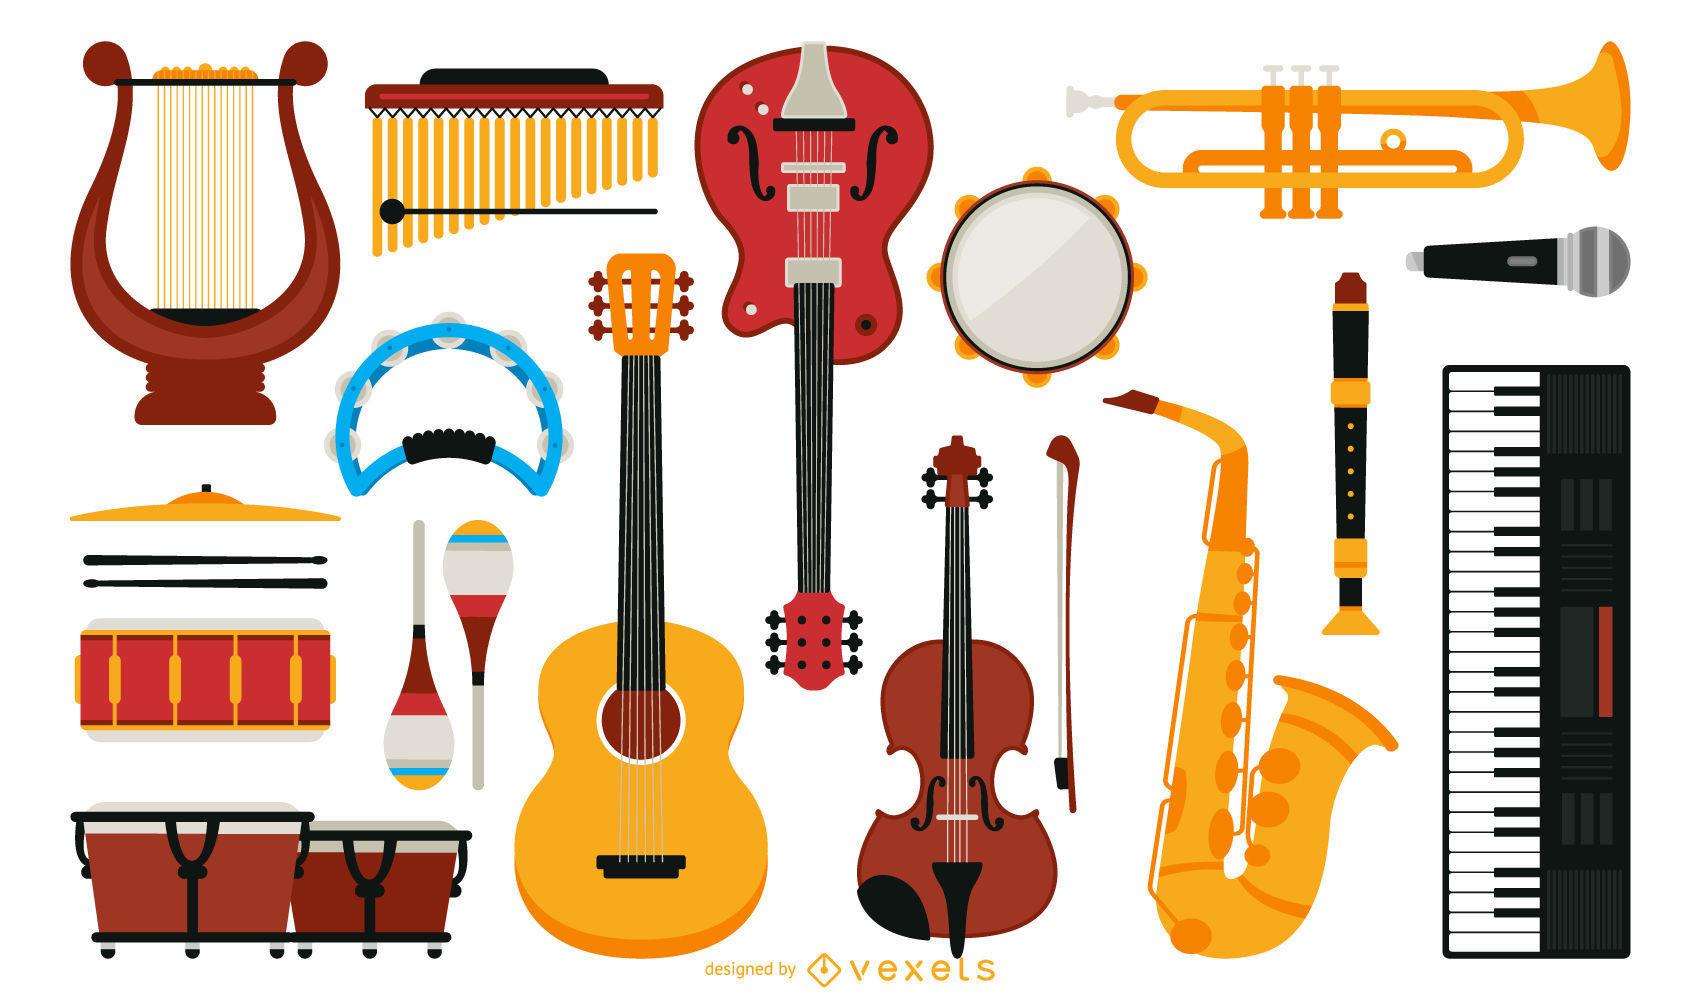 Dibujos De Instrumentos Musicales A Color Brainlylat